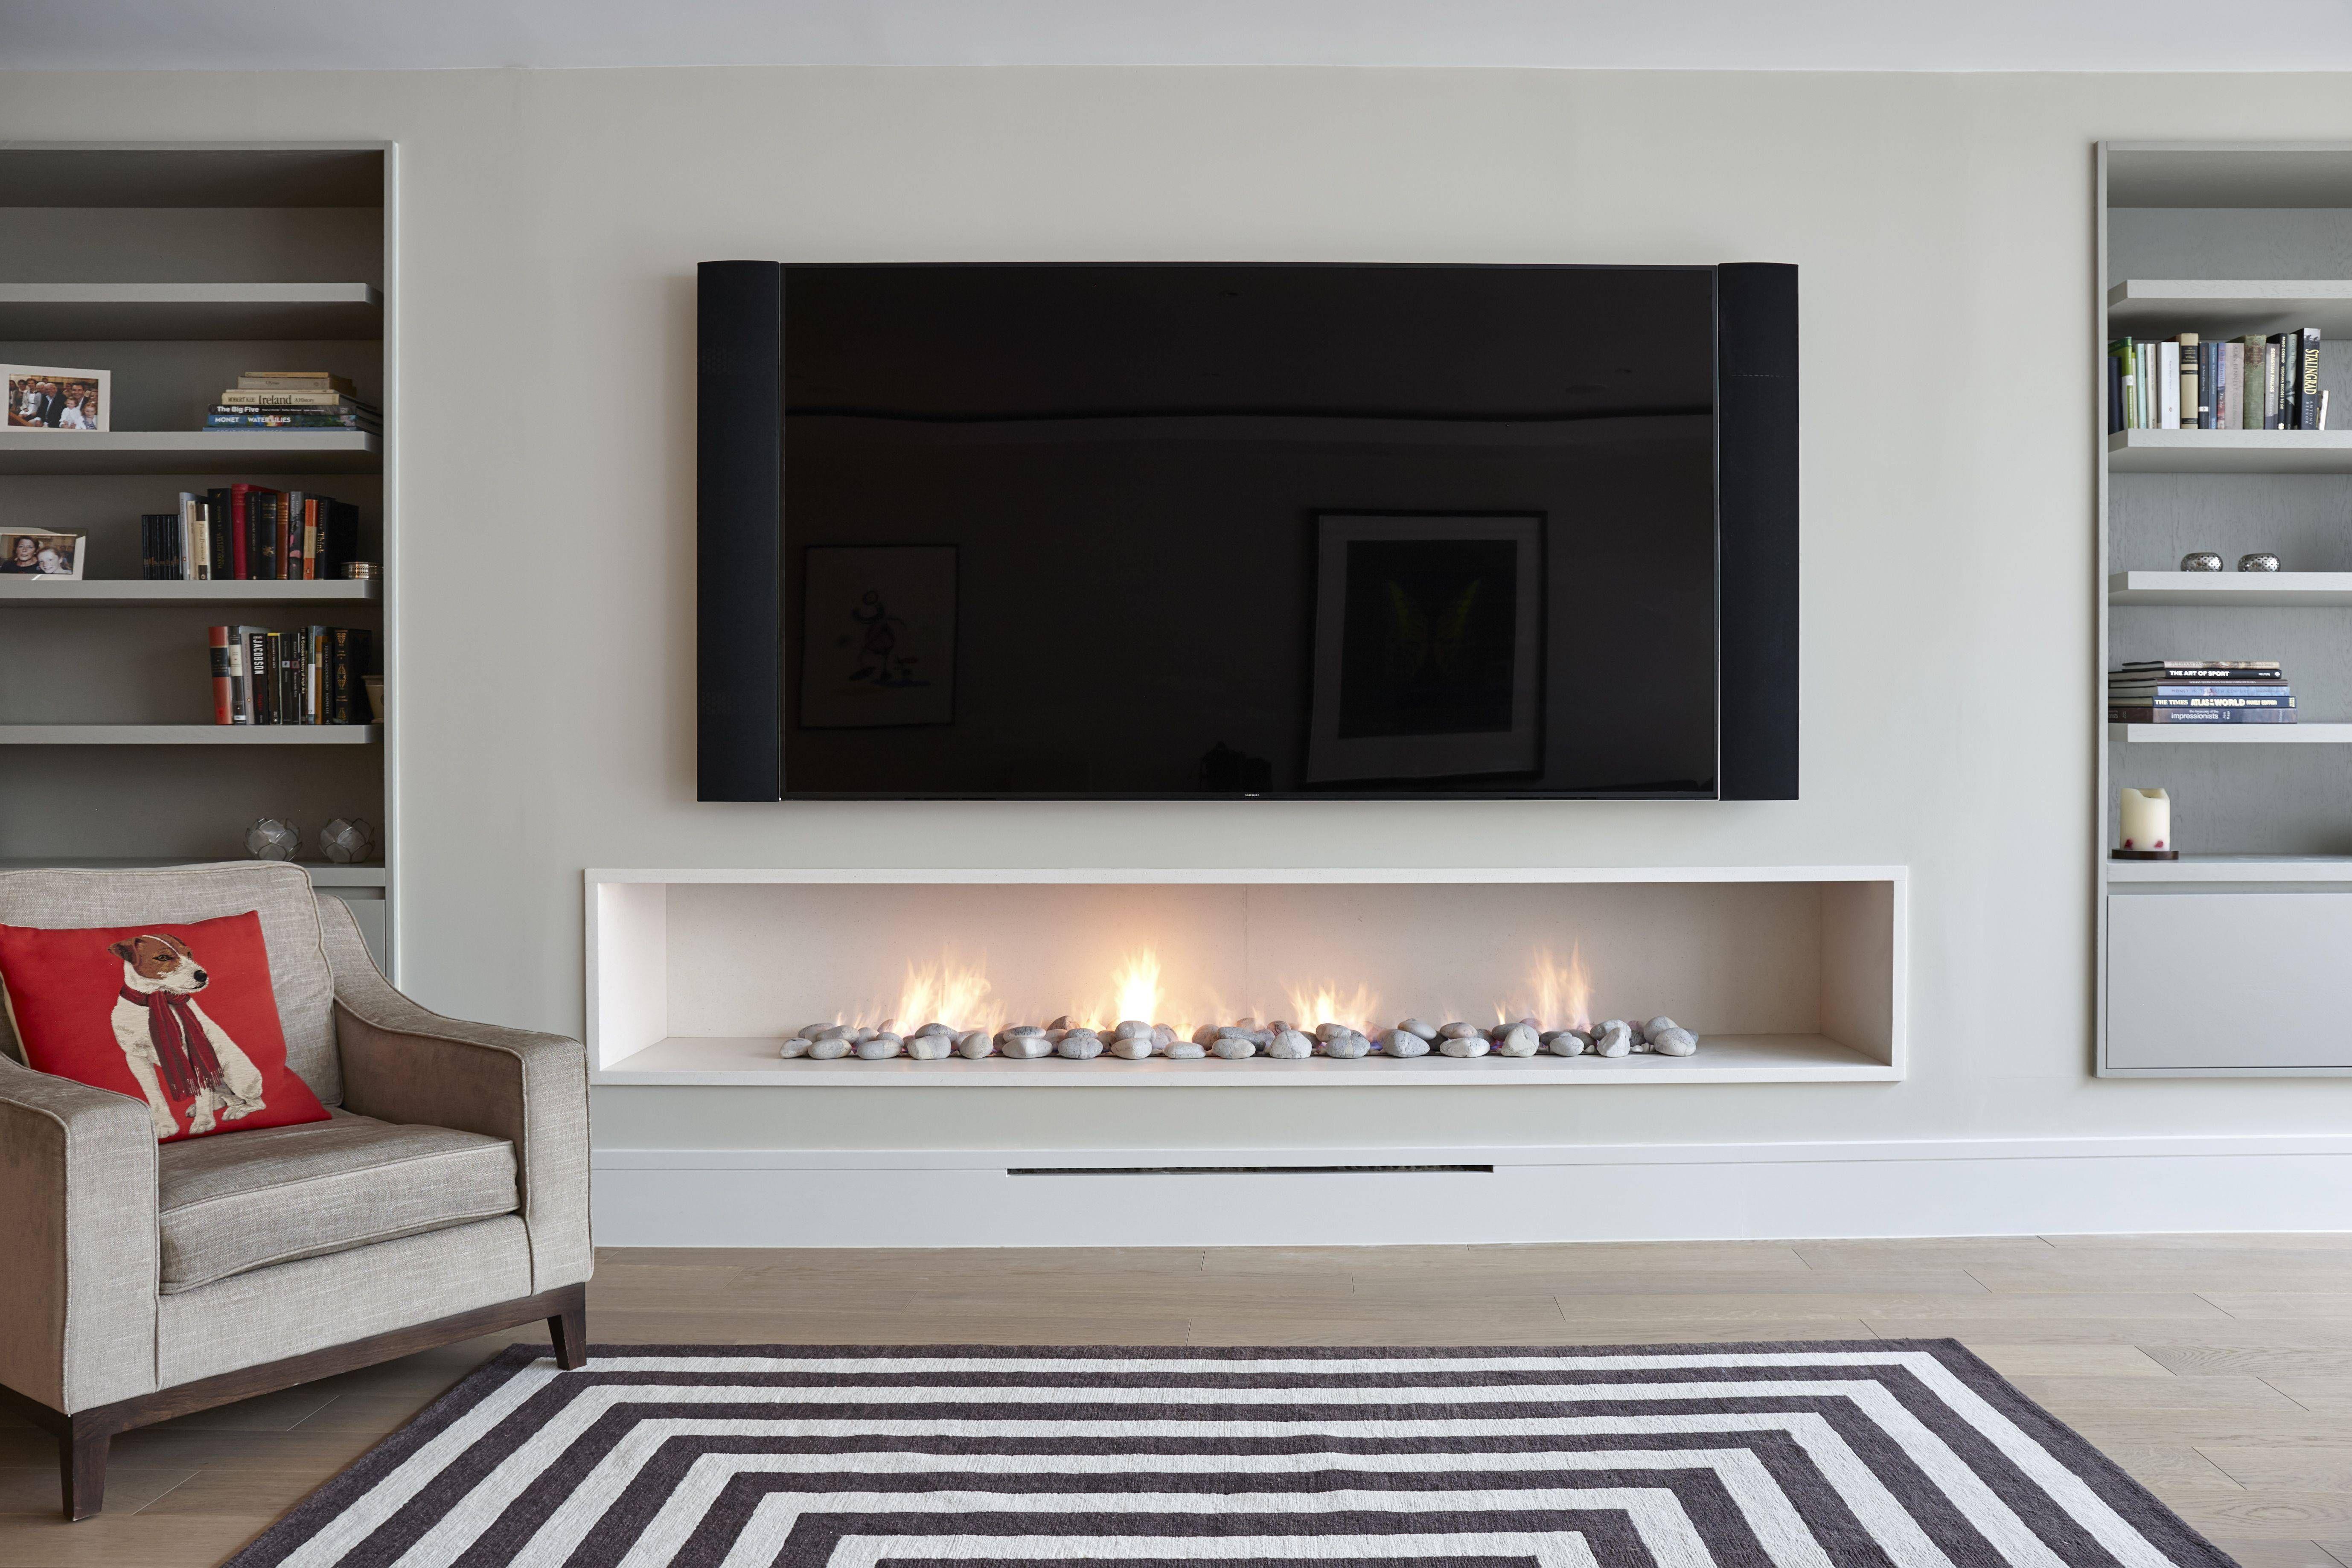 Adding A Fireplace Adding A Fireplace To A House Artificial Fireplace Best Fireplace Insert Best G Modern Fireplace Decor Contemporary Fireplace Home Fireplace